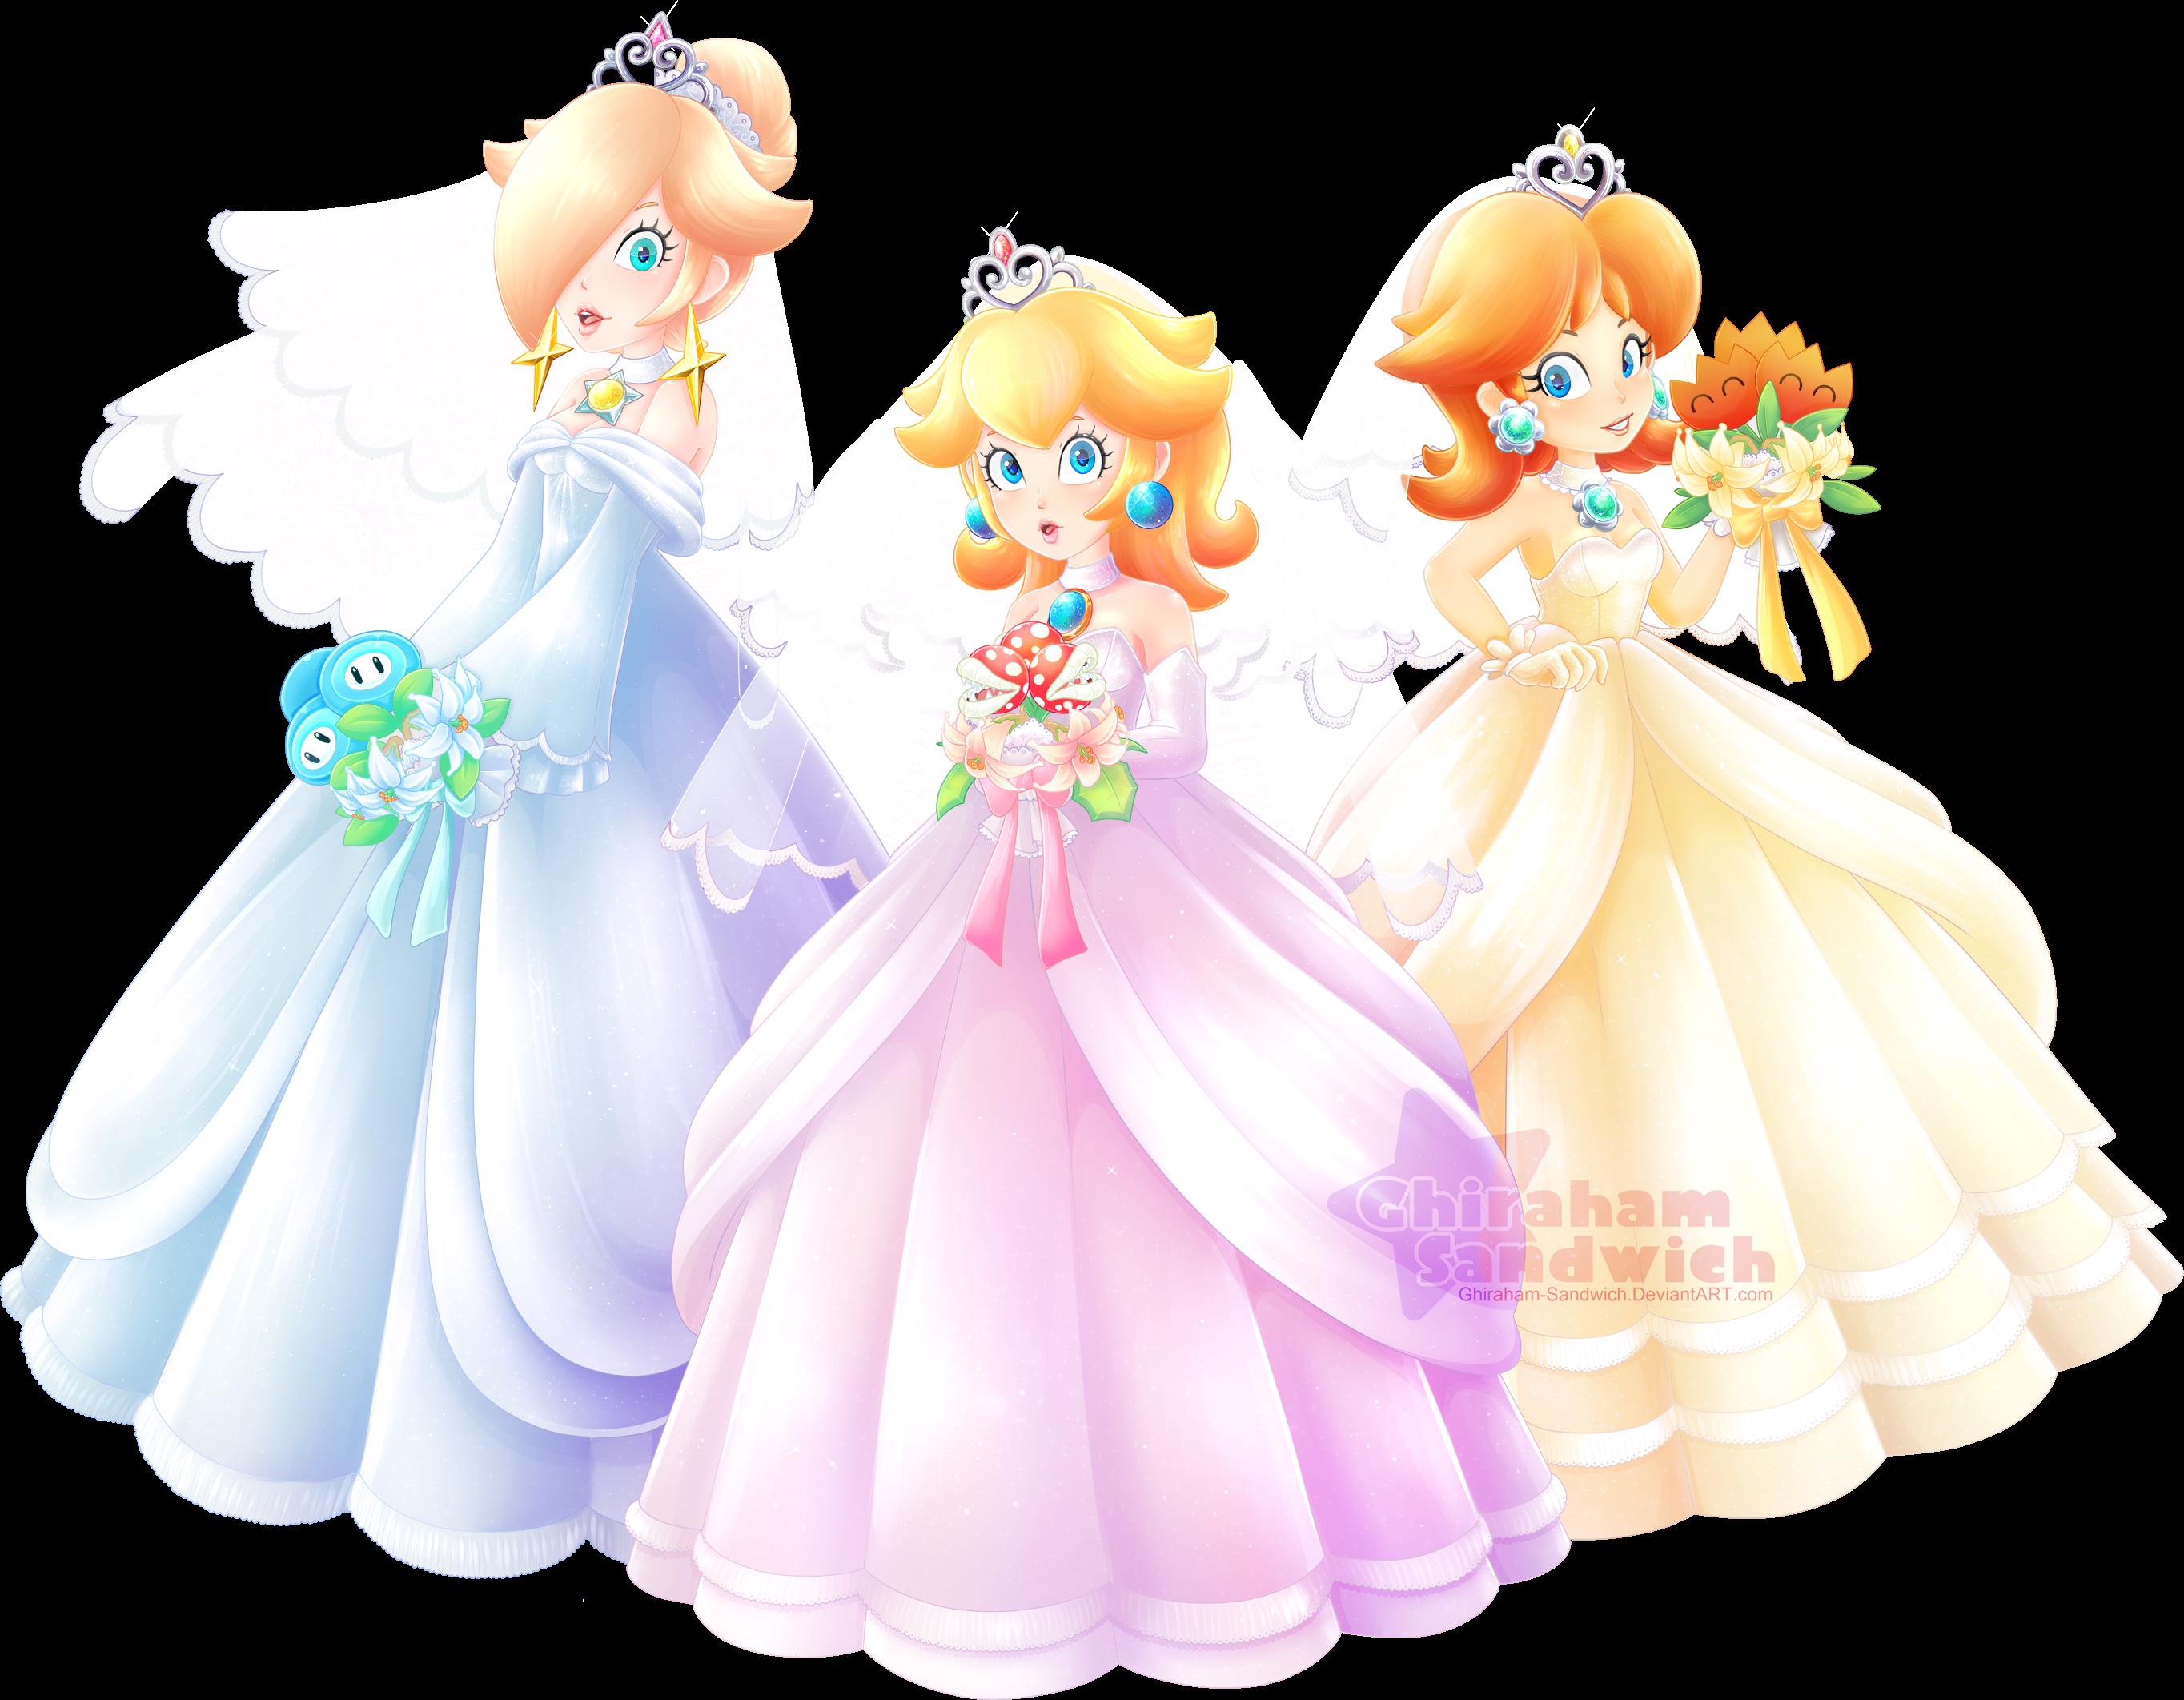 1 up girls super mario odyssey by ghiraham sandwich on for Princess peach wedding dress